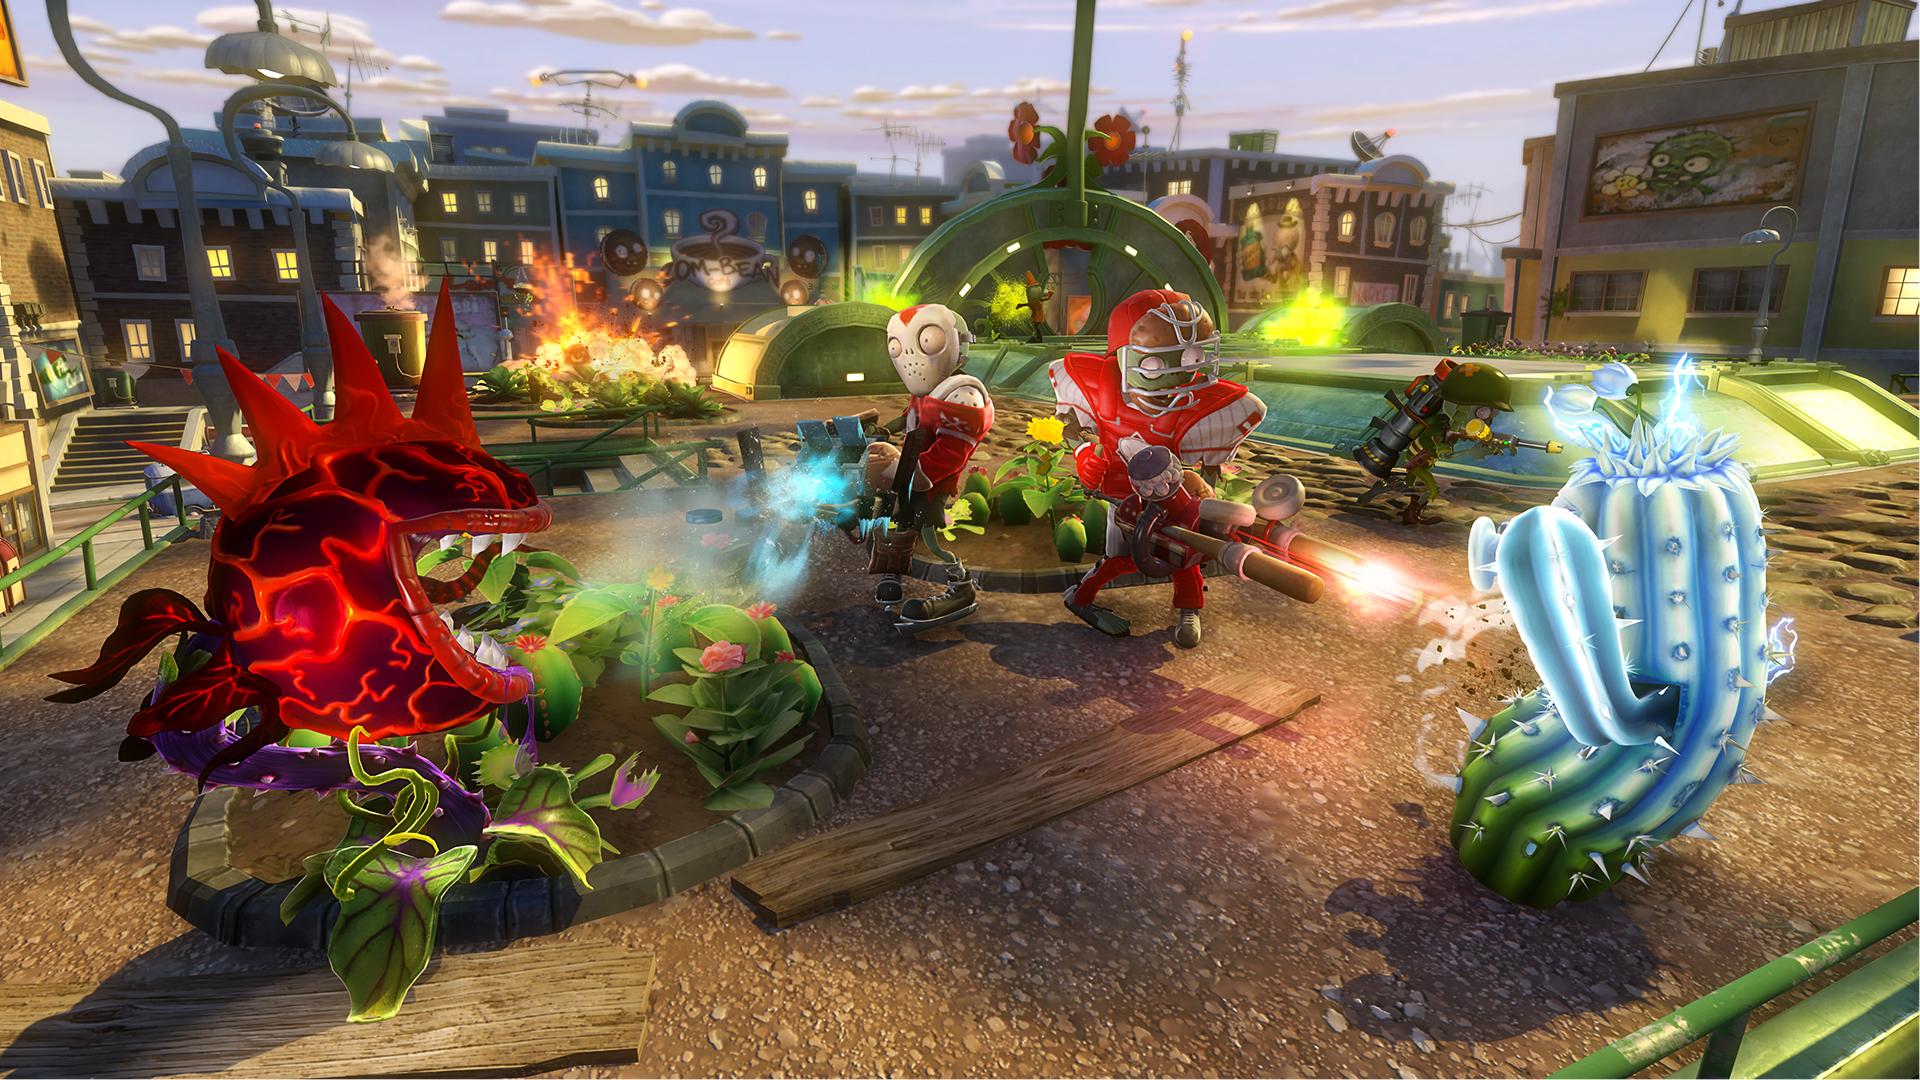 Good ... Garden Warfare Is An Always Online Game. Plants Vs Zombies